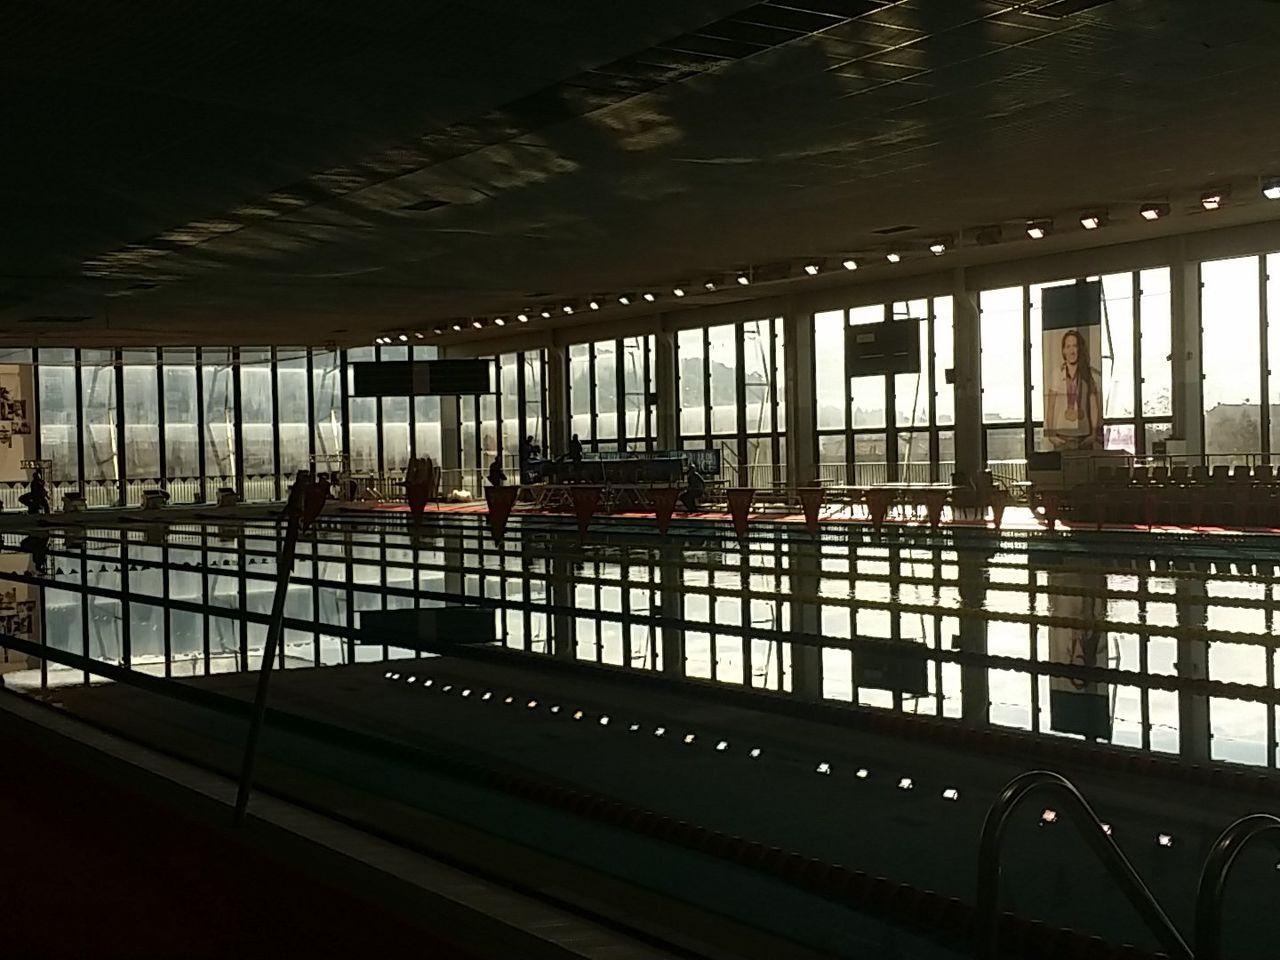 File:palais Des Sports Jean-Bouin (Nice).jpg - Wikimedia Commons avec Piscine Jean Bouin Nice